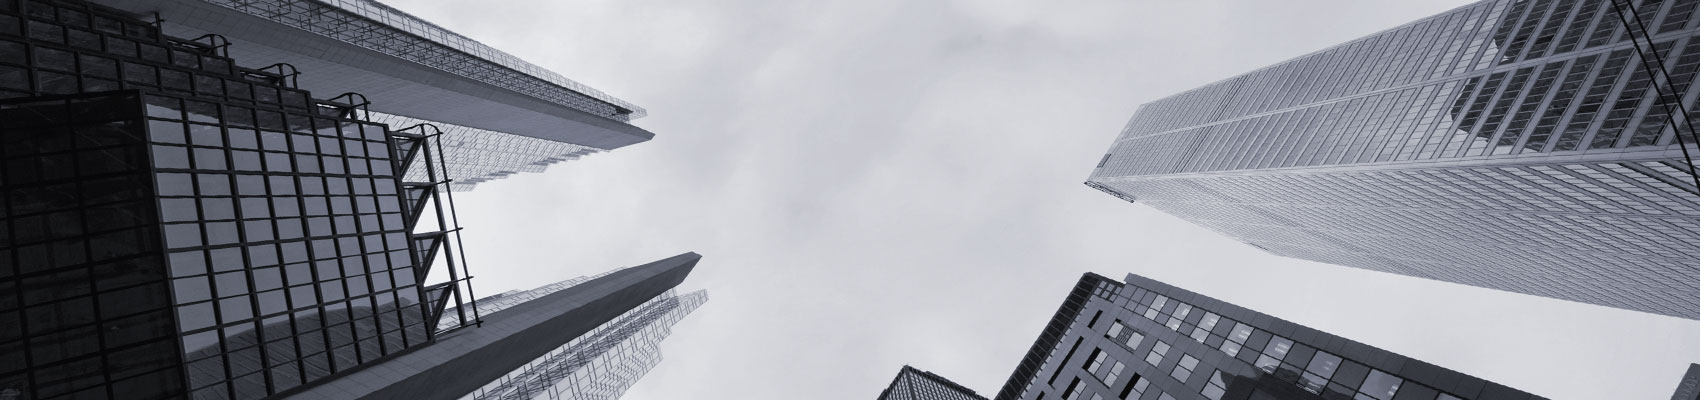 tillyard Property Management Company Toronto